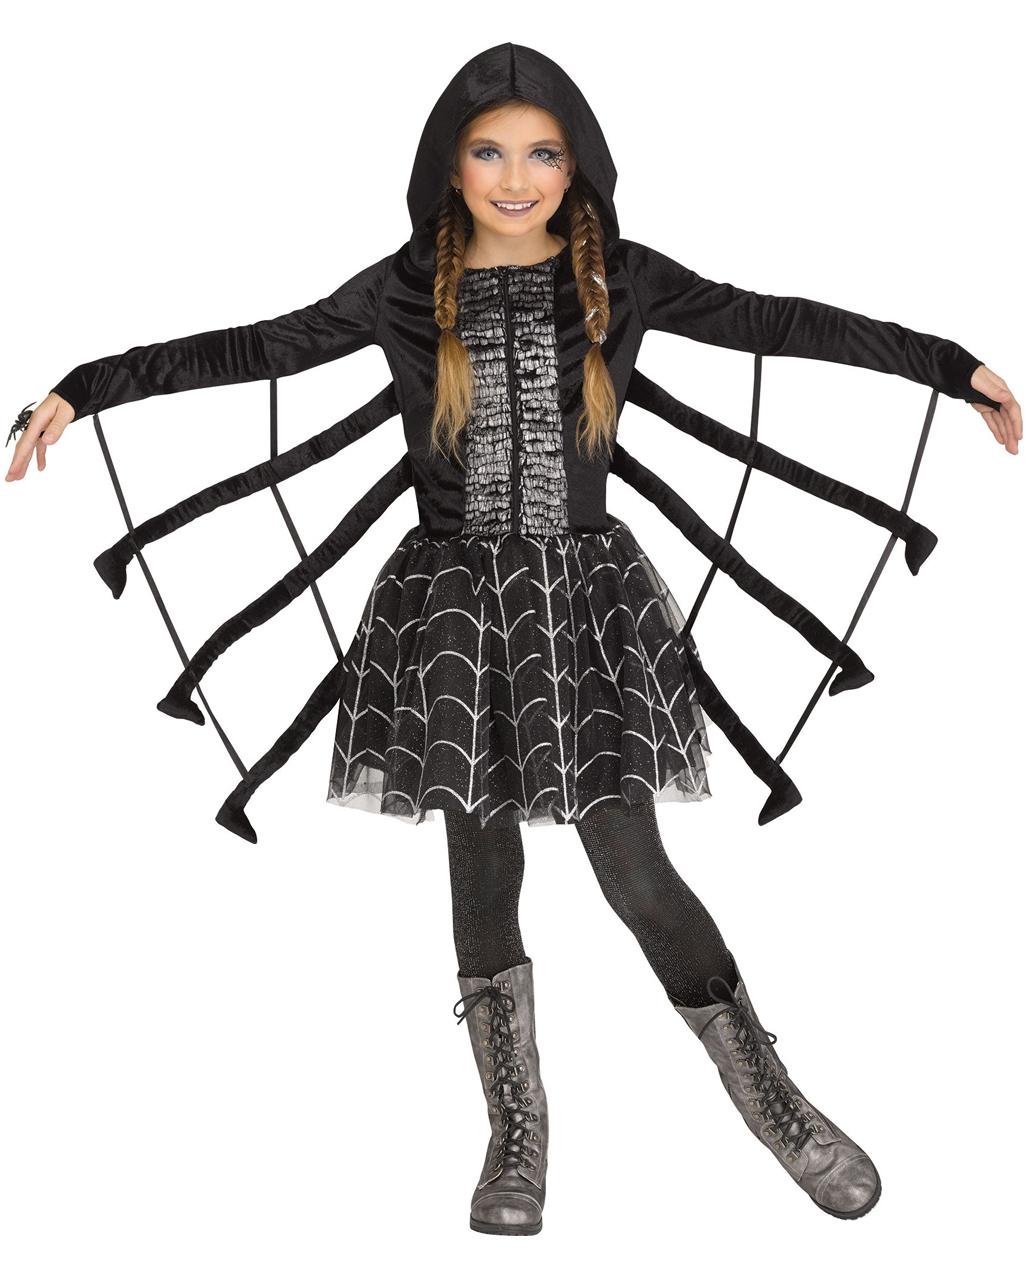 Glitter Spider Kids Costume As Halloween Costume Karneval Universe